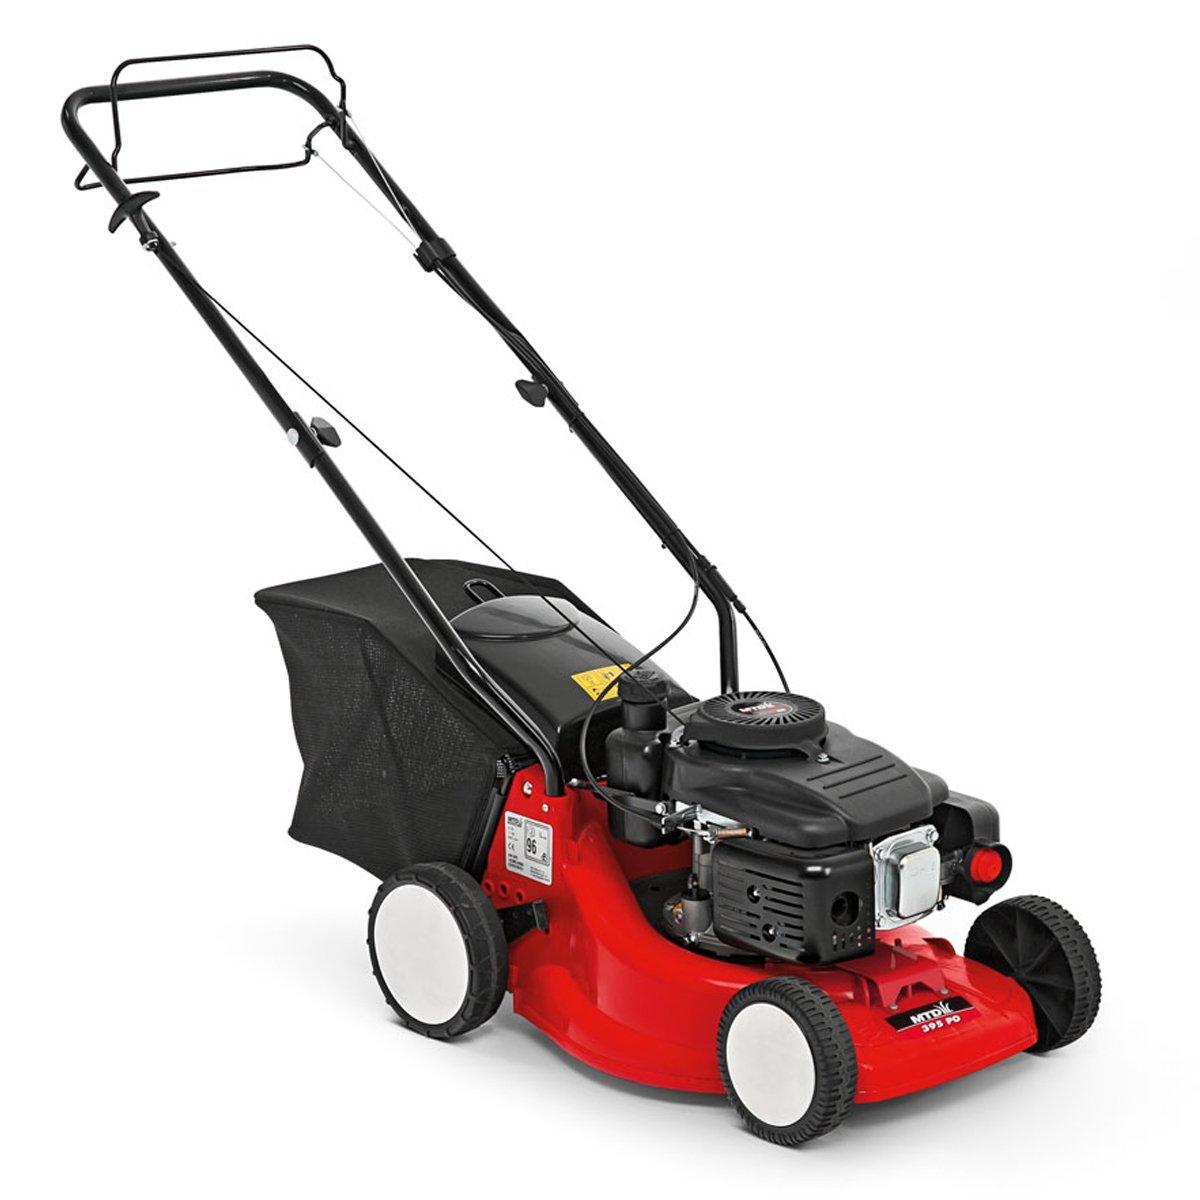 MTD Benzin-Rasenmäher Special Smart 395 SPO